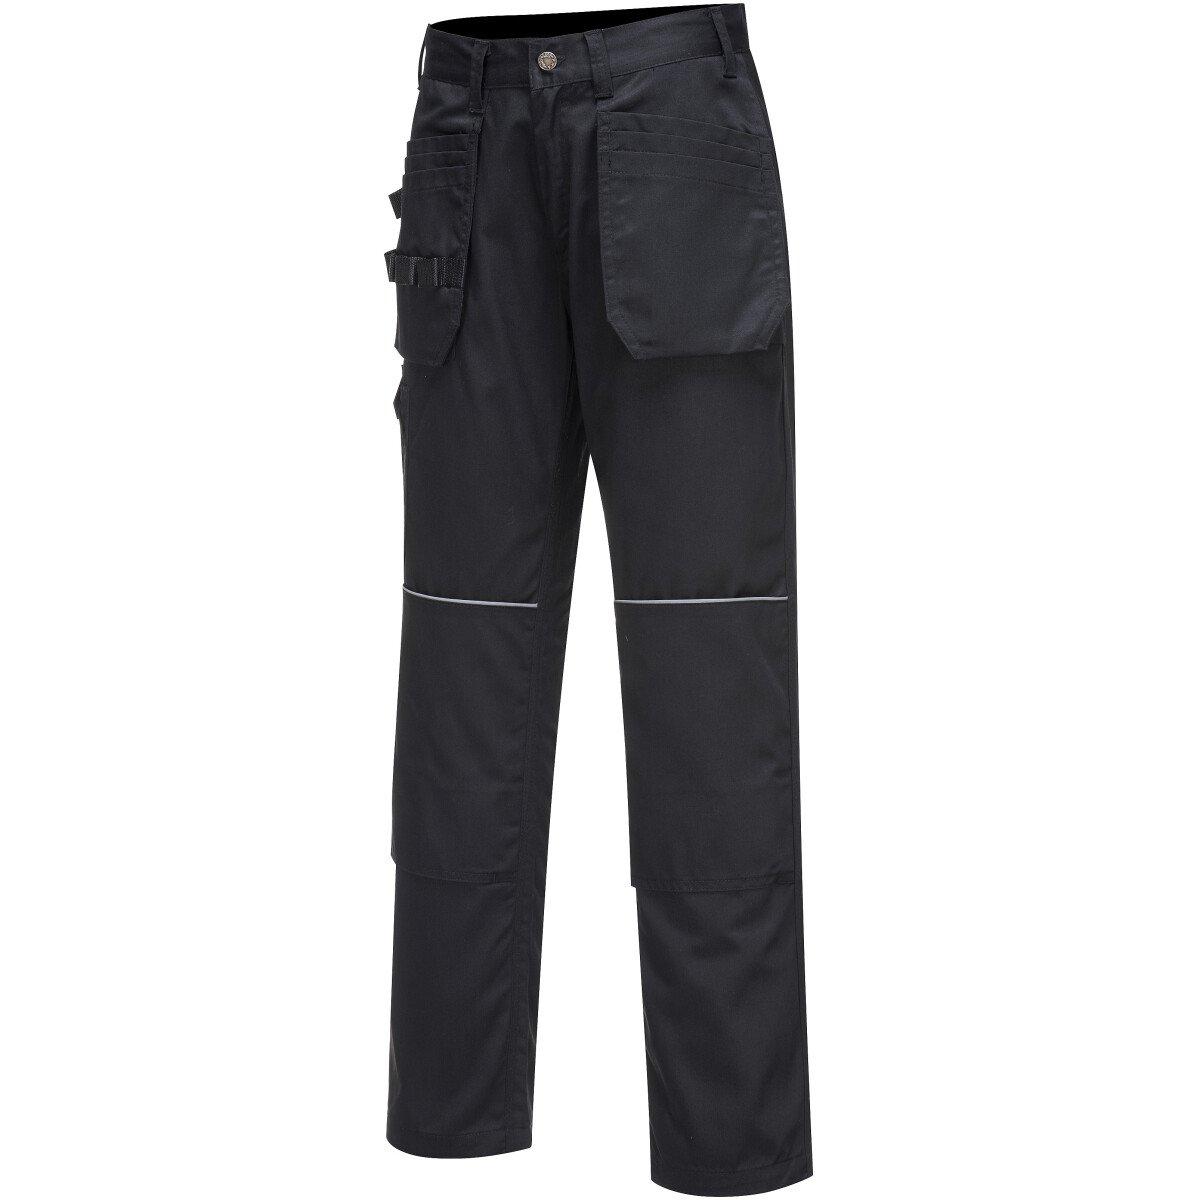 Portwest C720 Tradesman Holster Trouser Multipocket Workwear